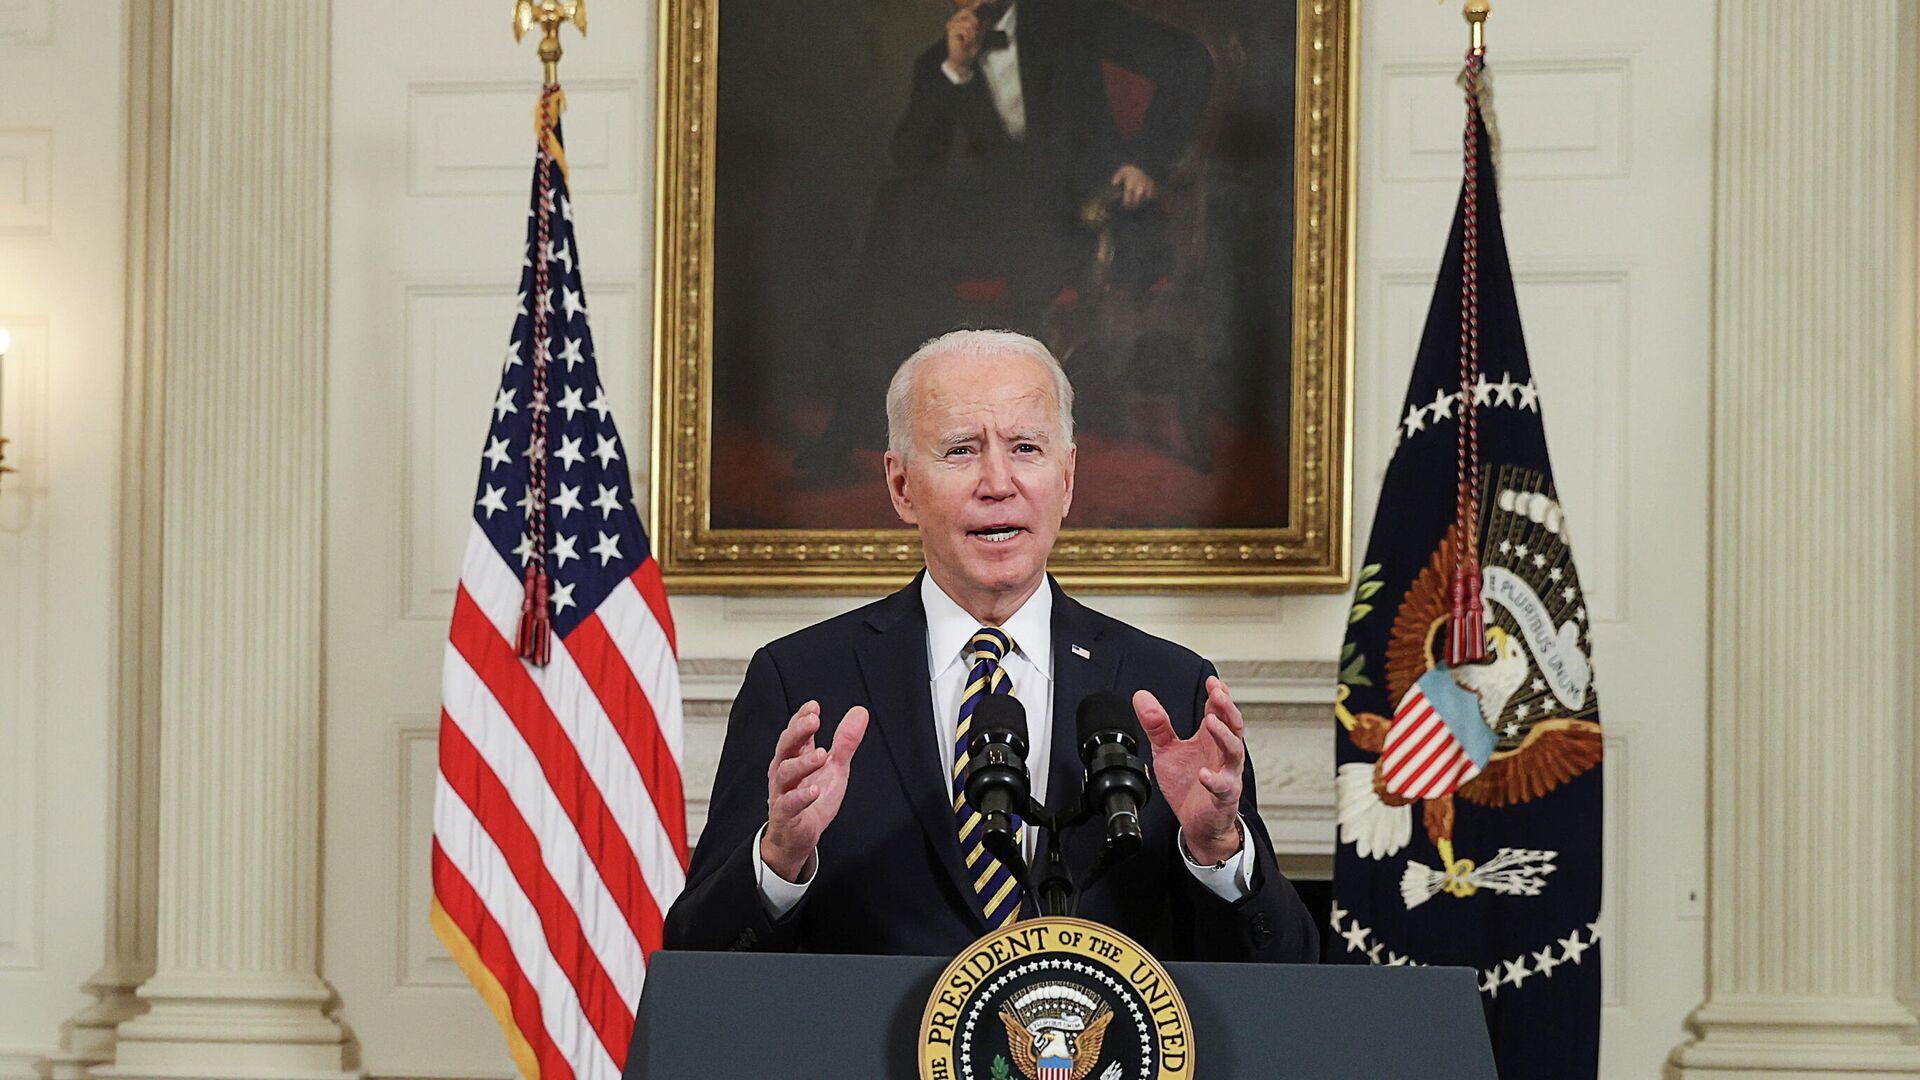 Joe Biden, presidente de EEUU - Sputnik Mundo, 1920, 26.02.2021